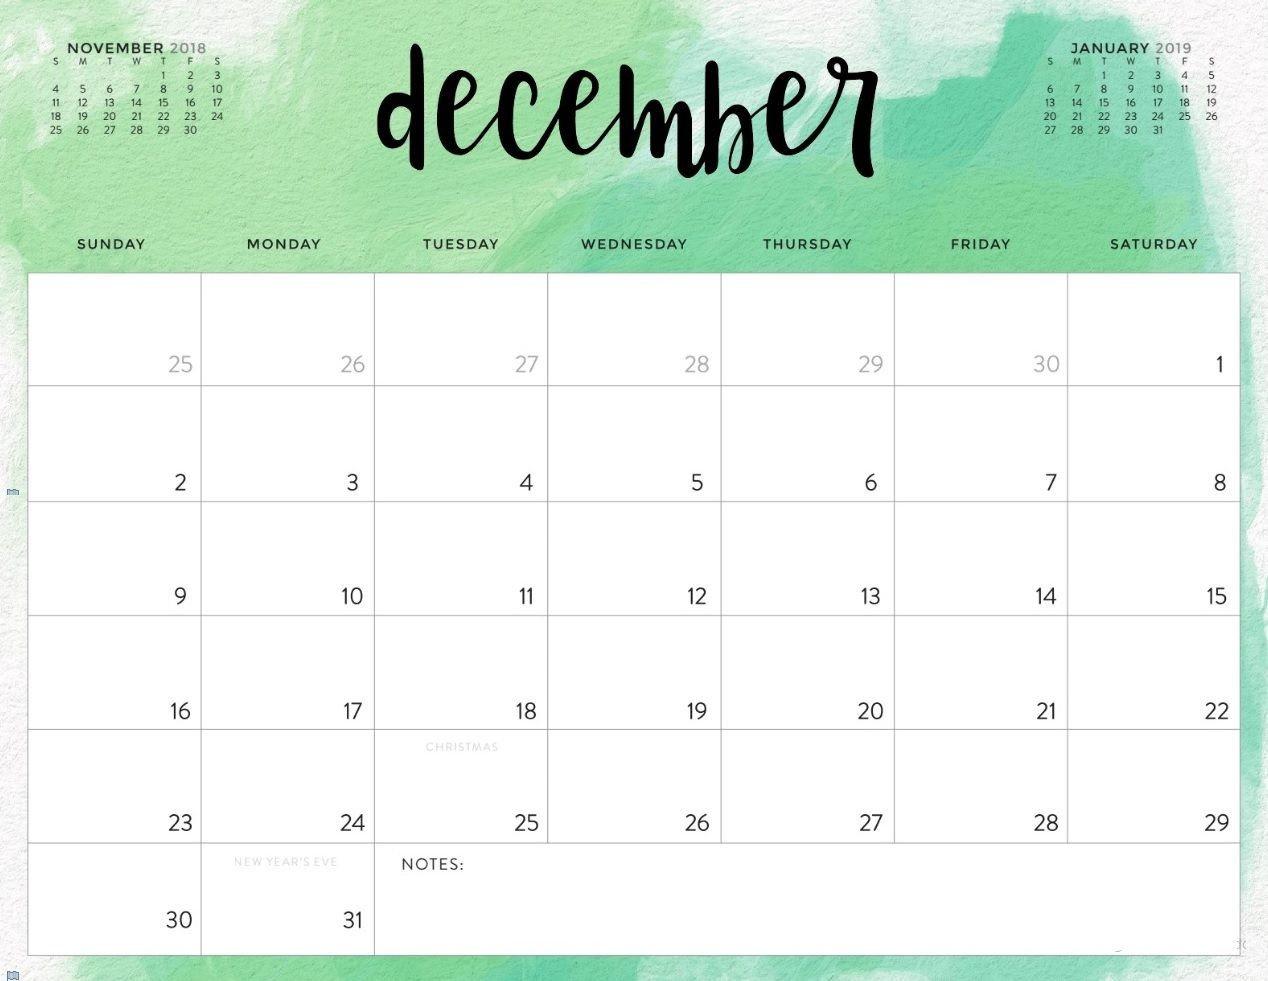 Custom Calendar For Business – Marry Steven – Medium A Calendar That I Can Edit